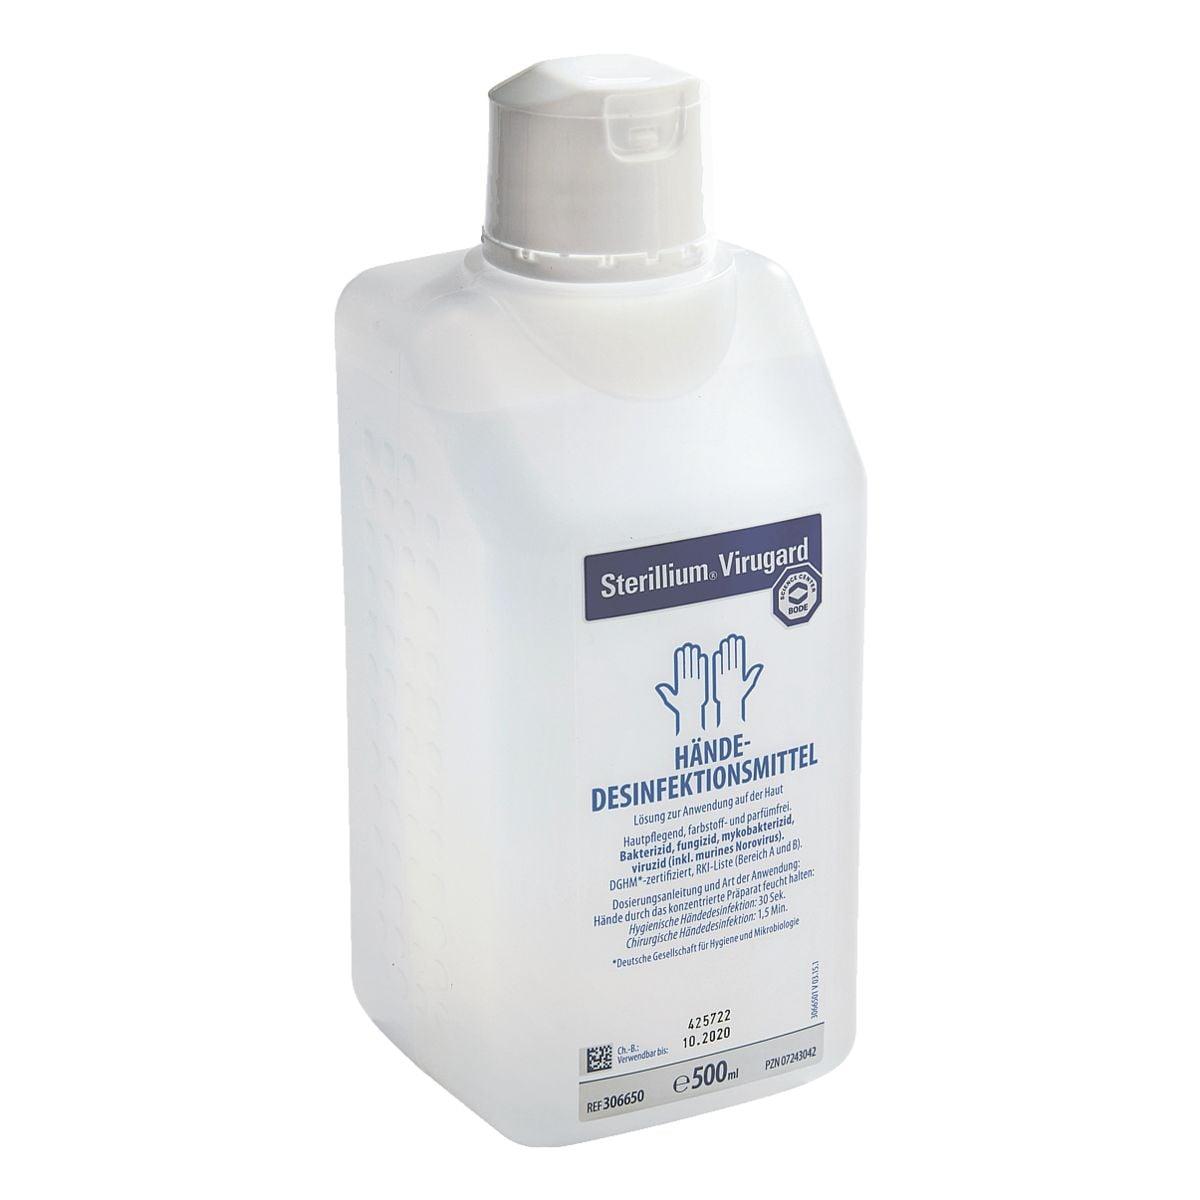 HARTMANN Handdesinfektionsmittel »Sterillium Virugard« 500 ml